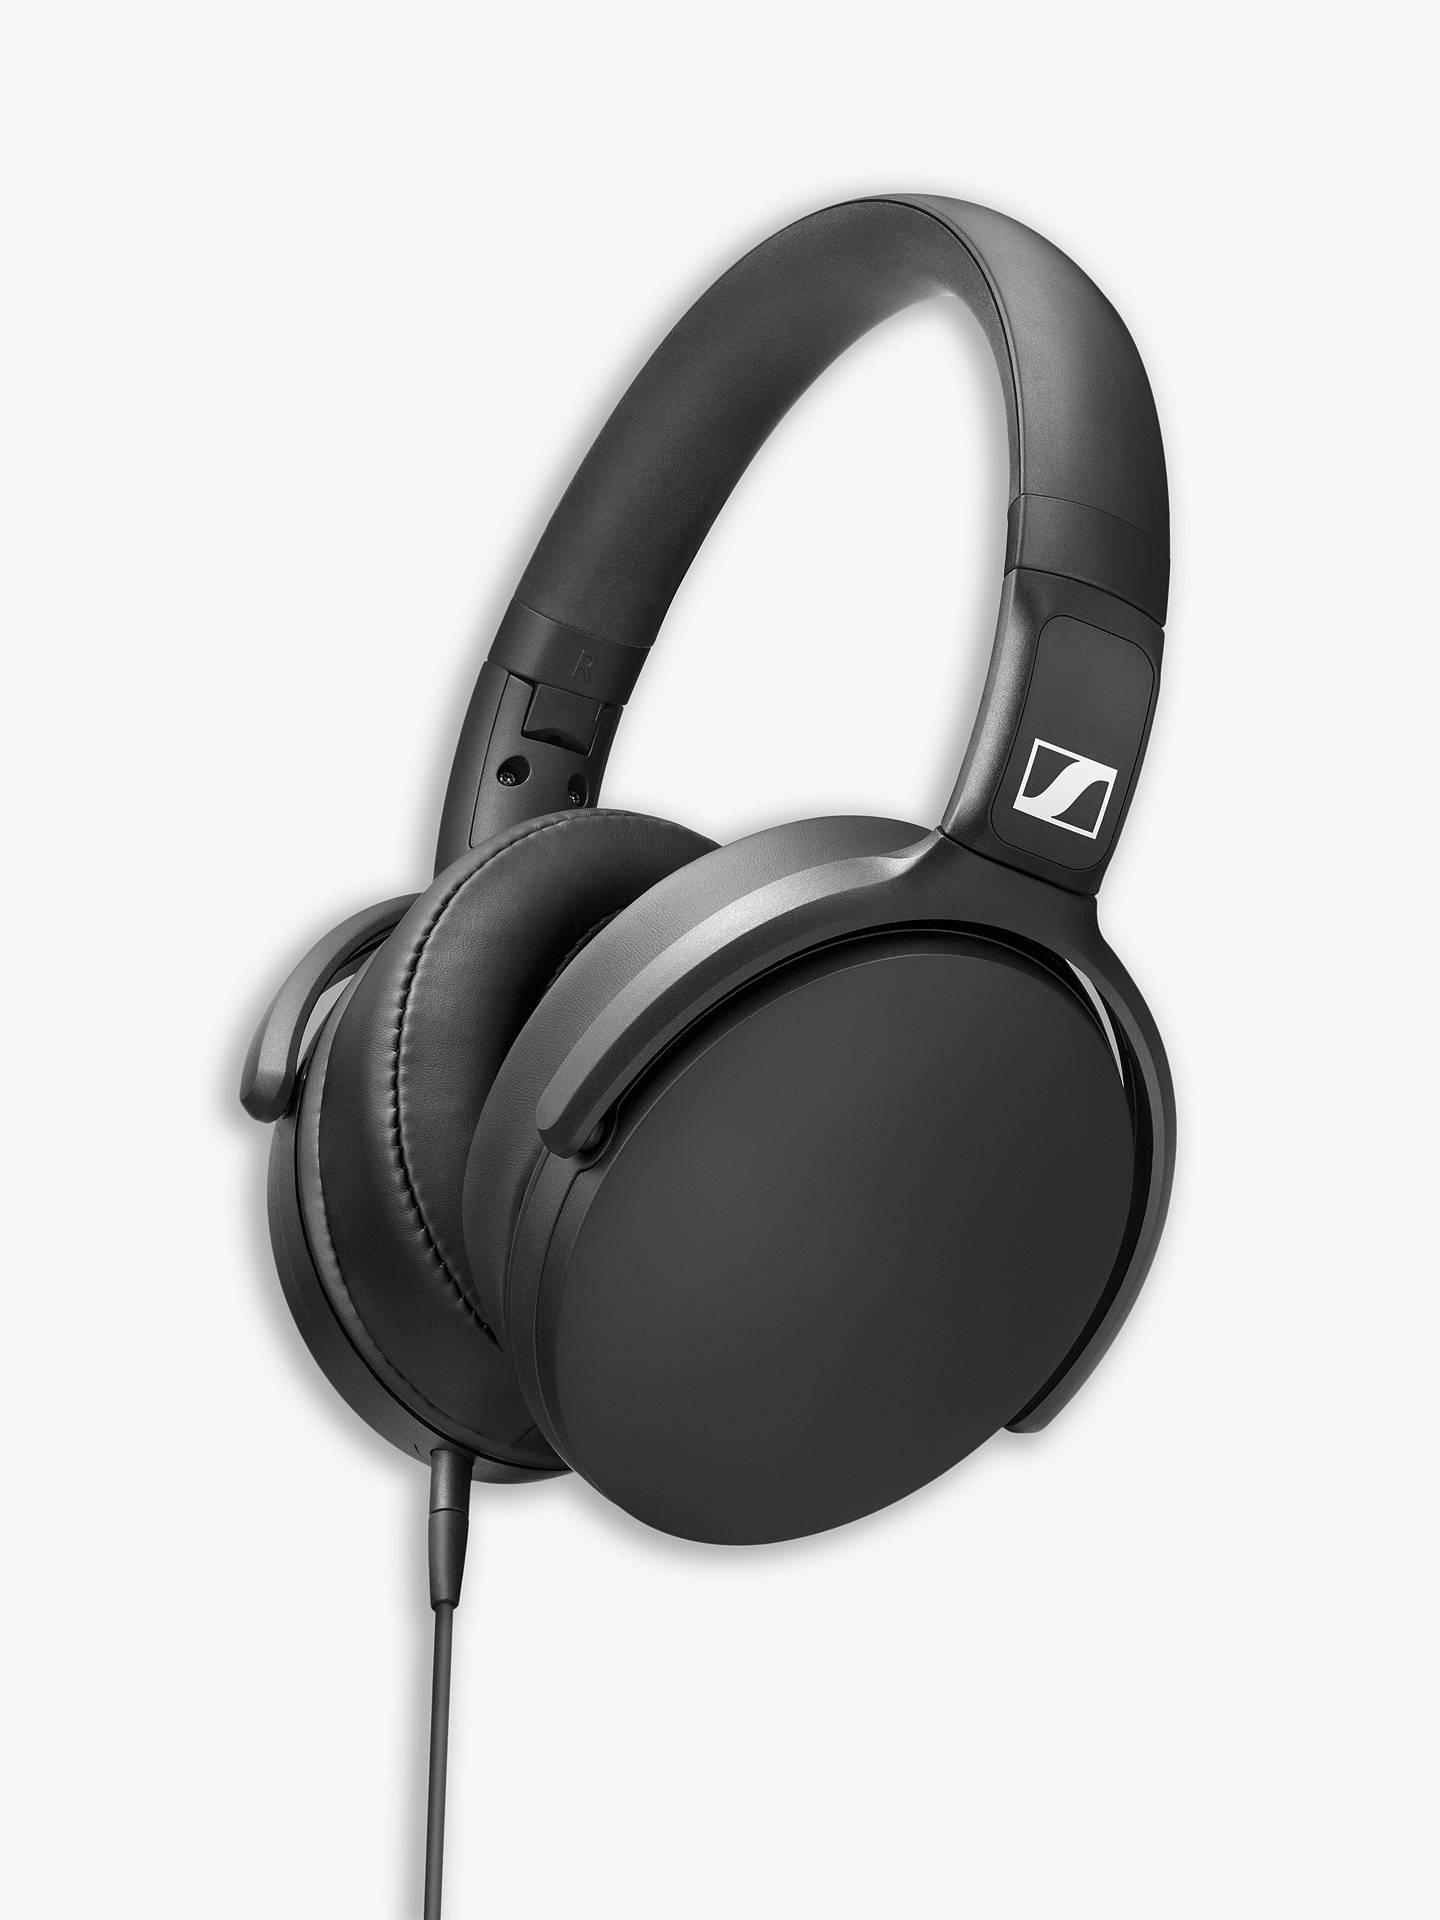 buying new sneakers huge sale Sennheiser HD 400S Over-Ear Headphones with Mic/Remote, Black at ...